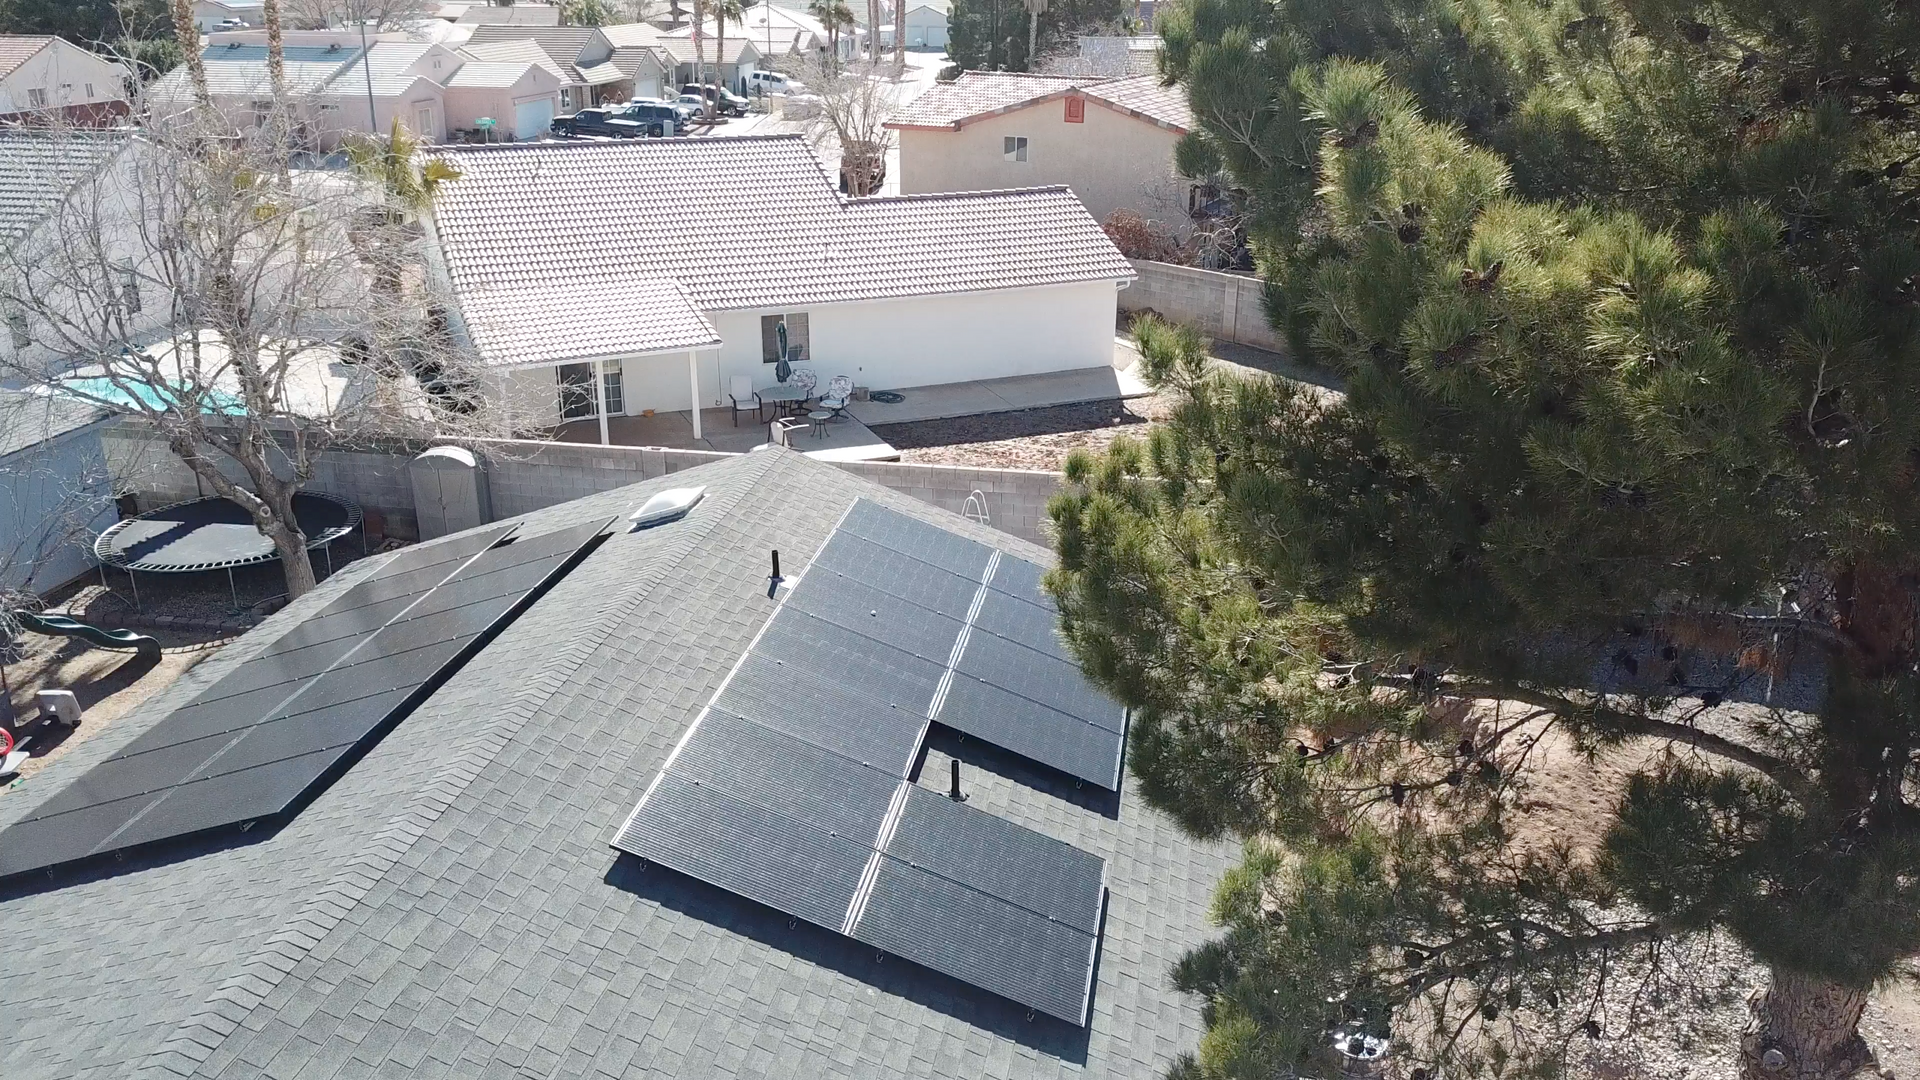 Solar Installation in Mesquite, NV by GST Nevada